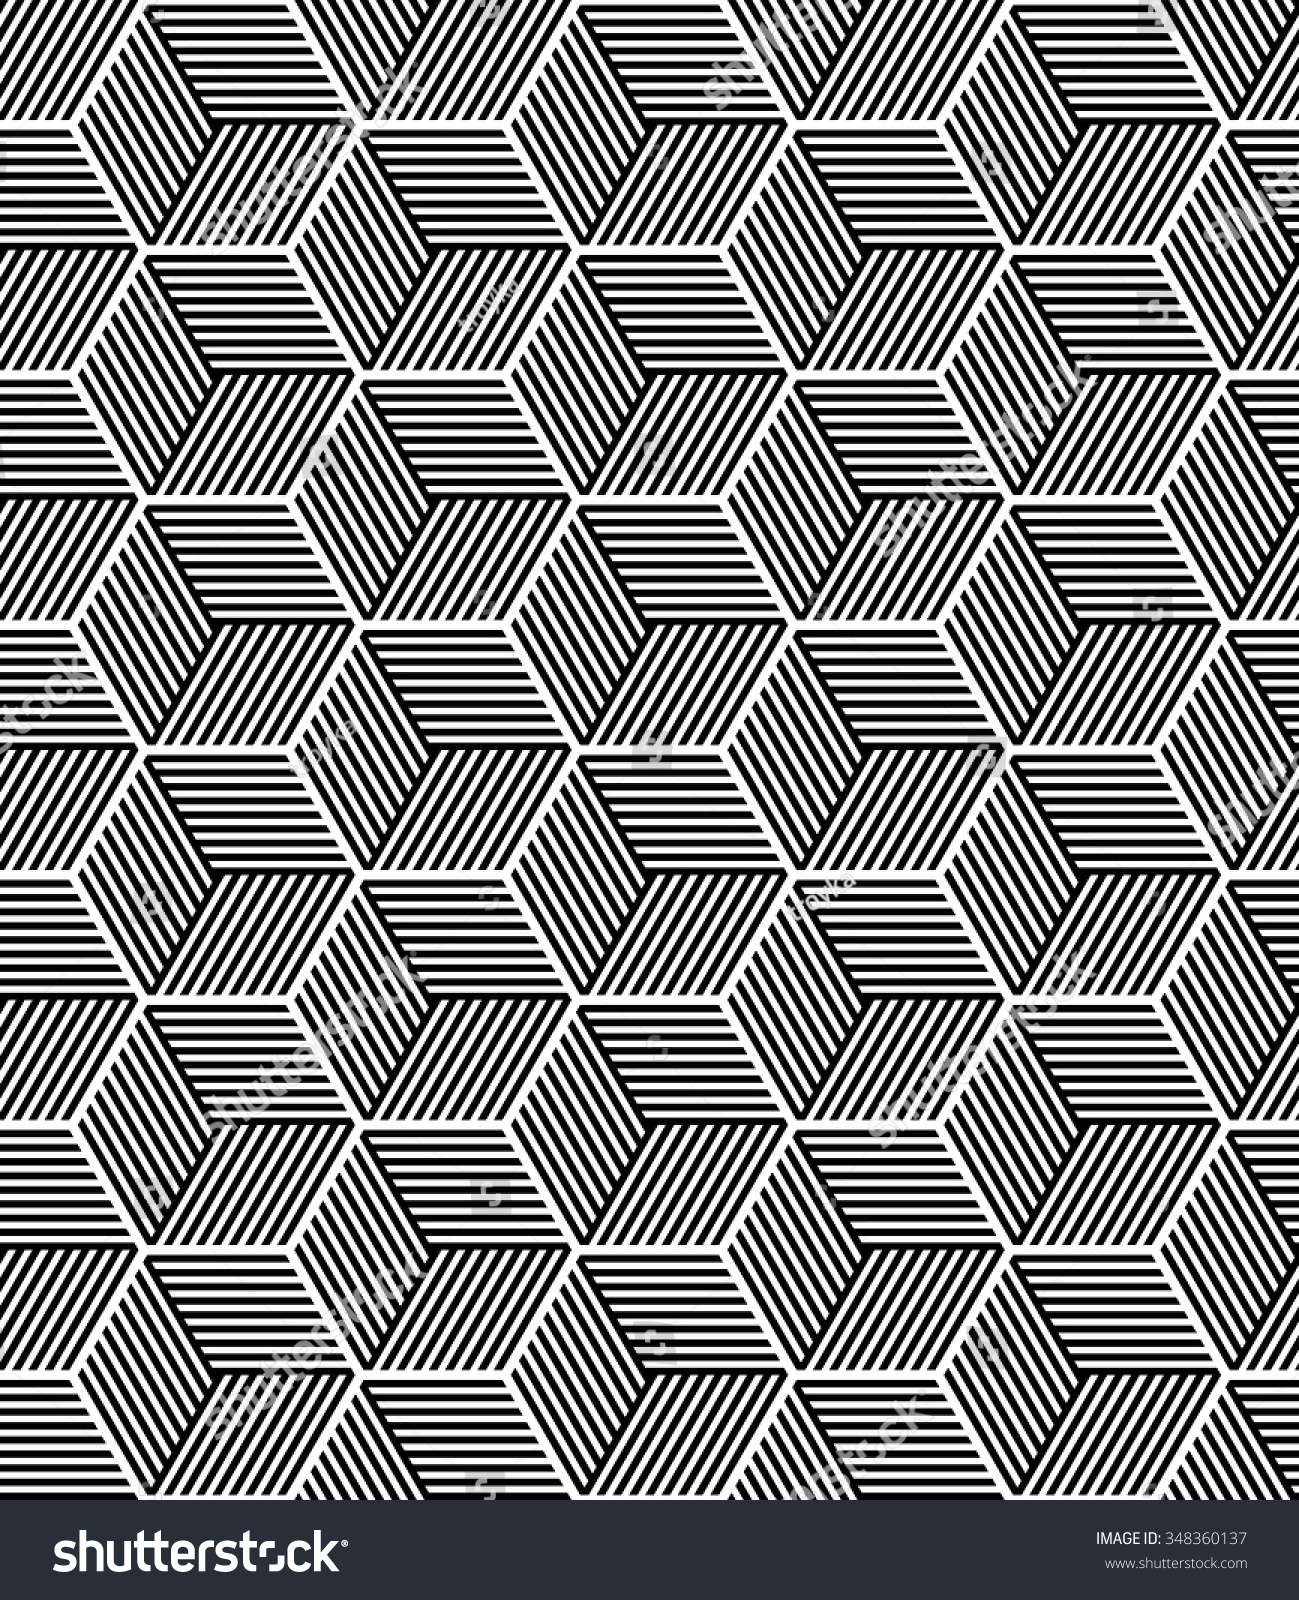 Seamless op art pattern 3d illusion stock vector 348360137 for Geometric illusion art